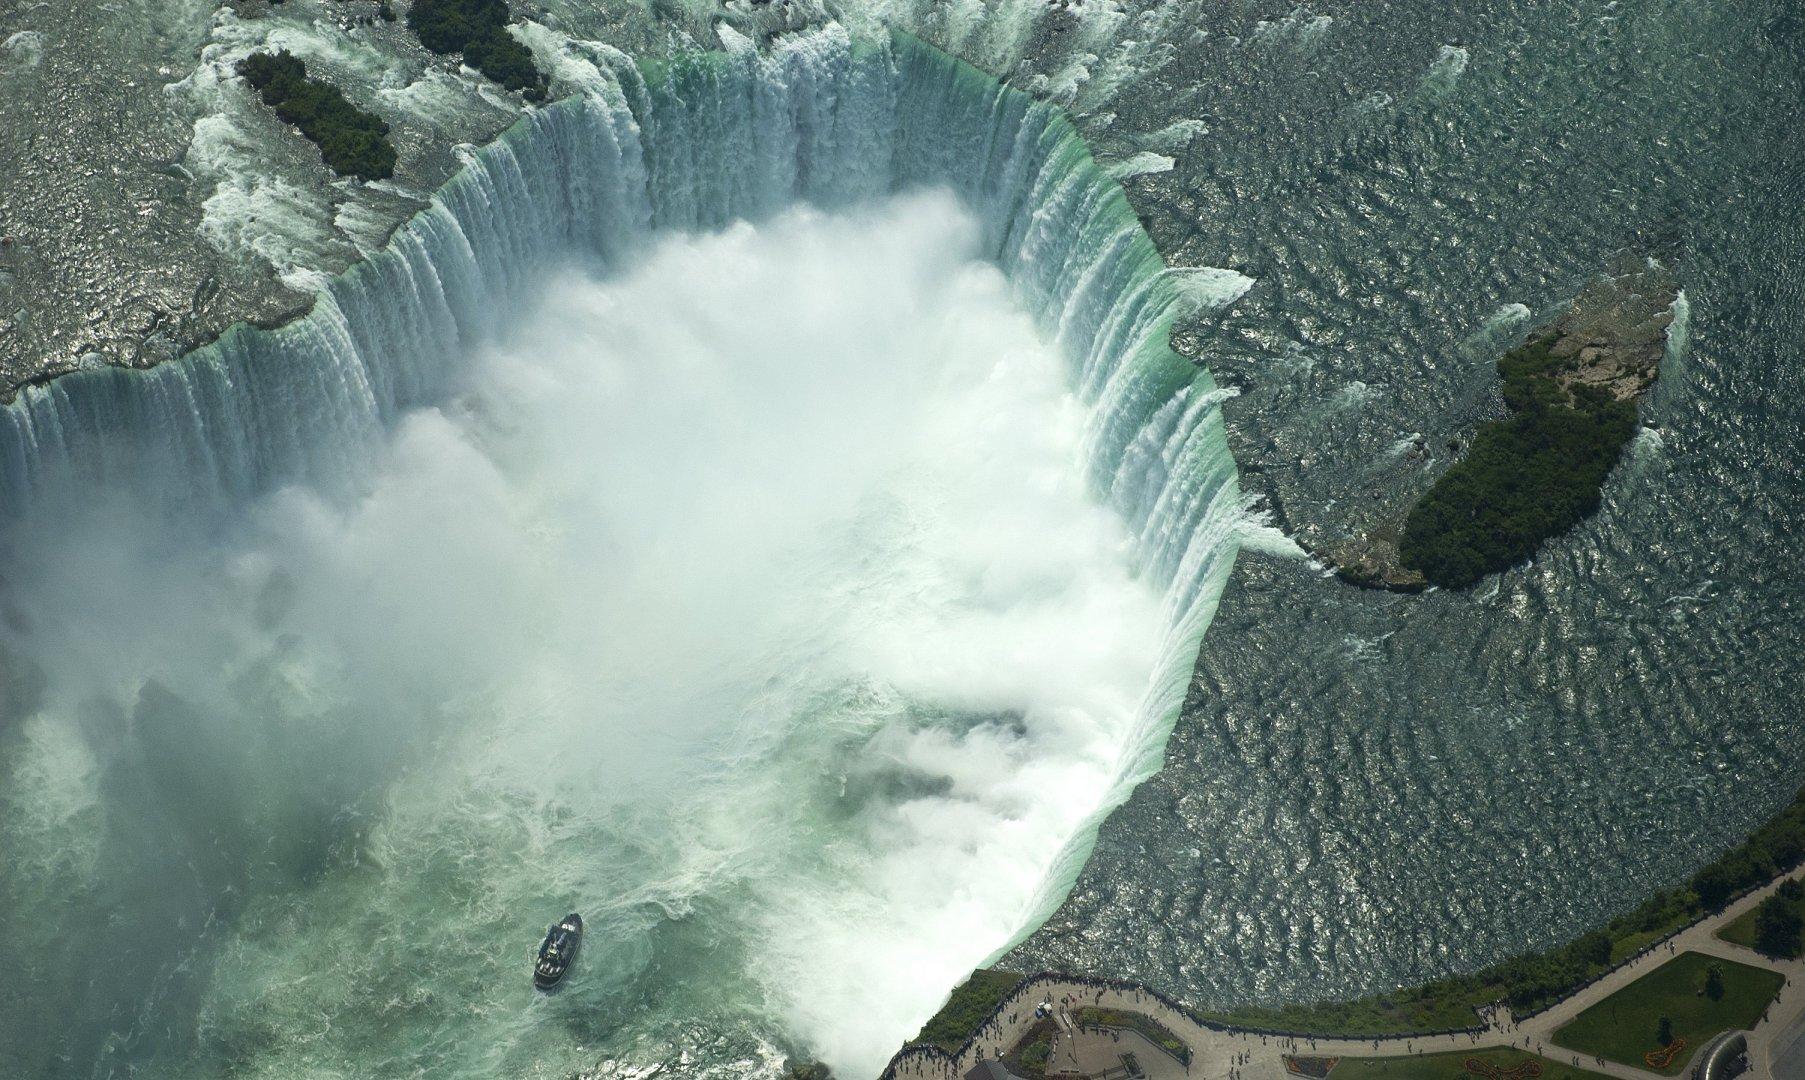 aerial-view-of-Niagara-Falls-with-boat.jpg